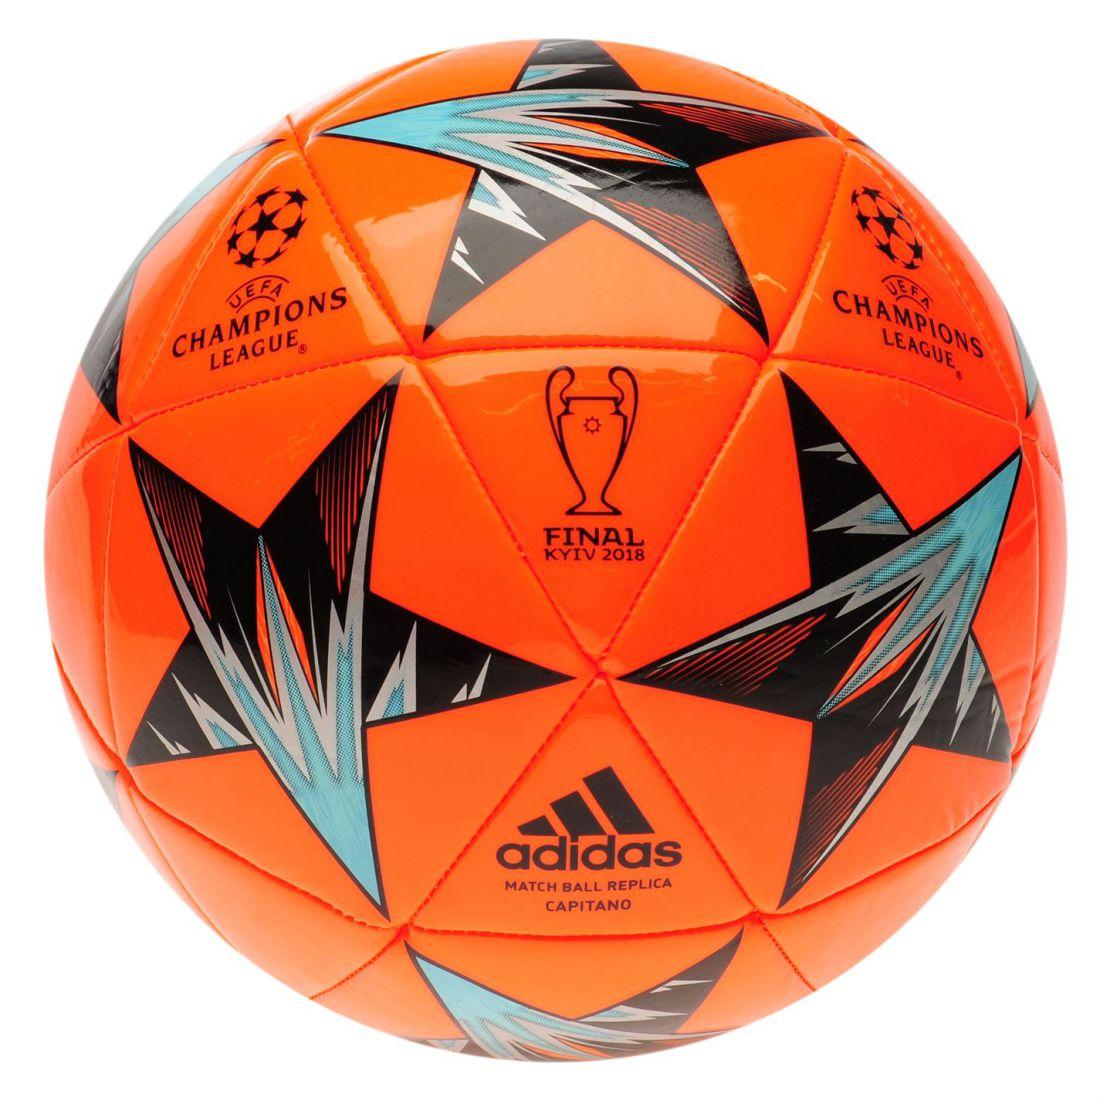 adidas 2015 uefa champions league final glider football